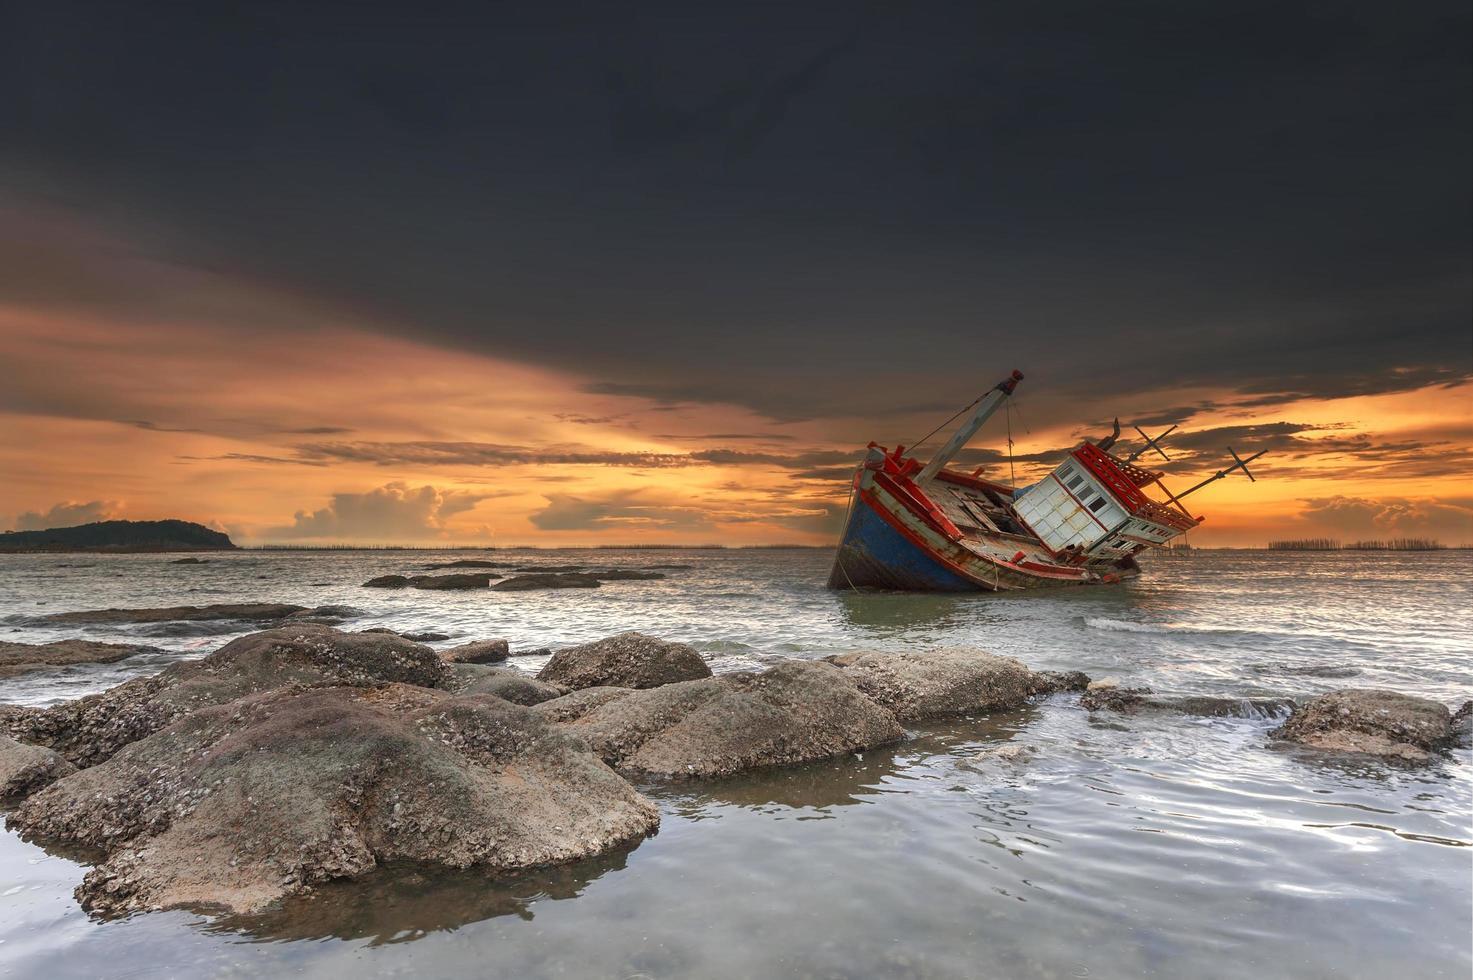 naufragio a chonburi, Tailandia foto